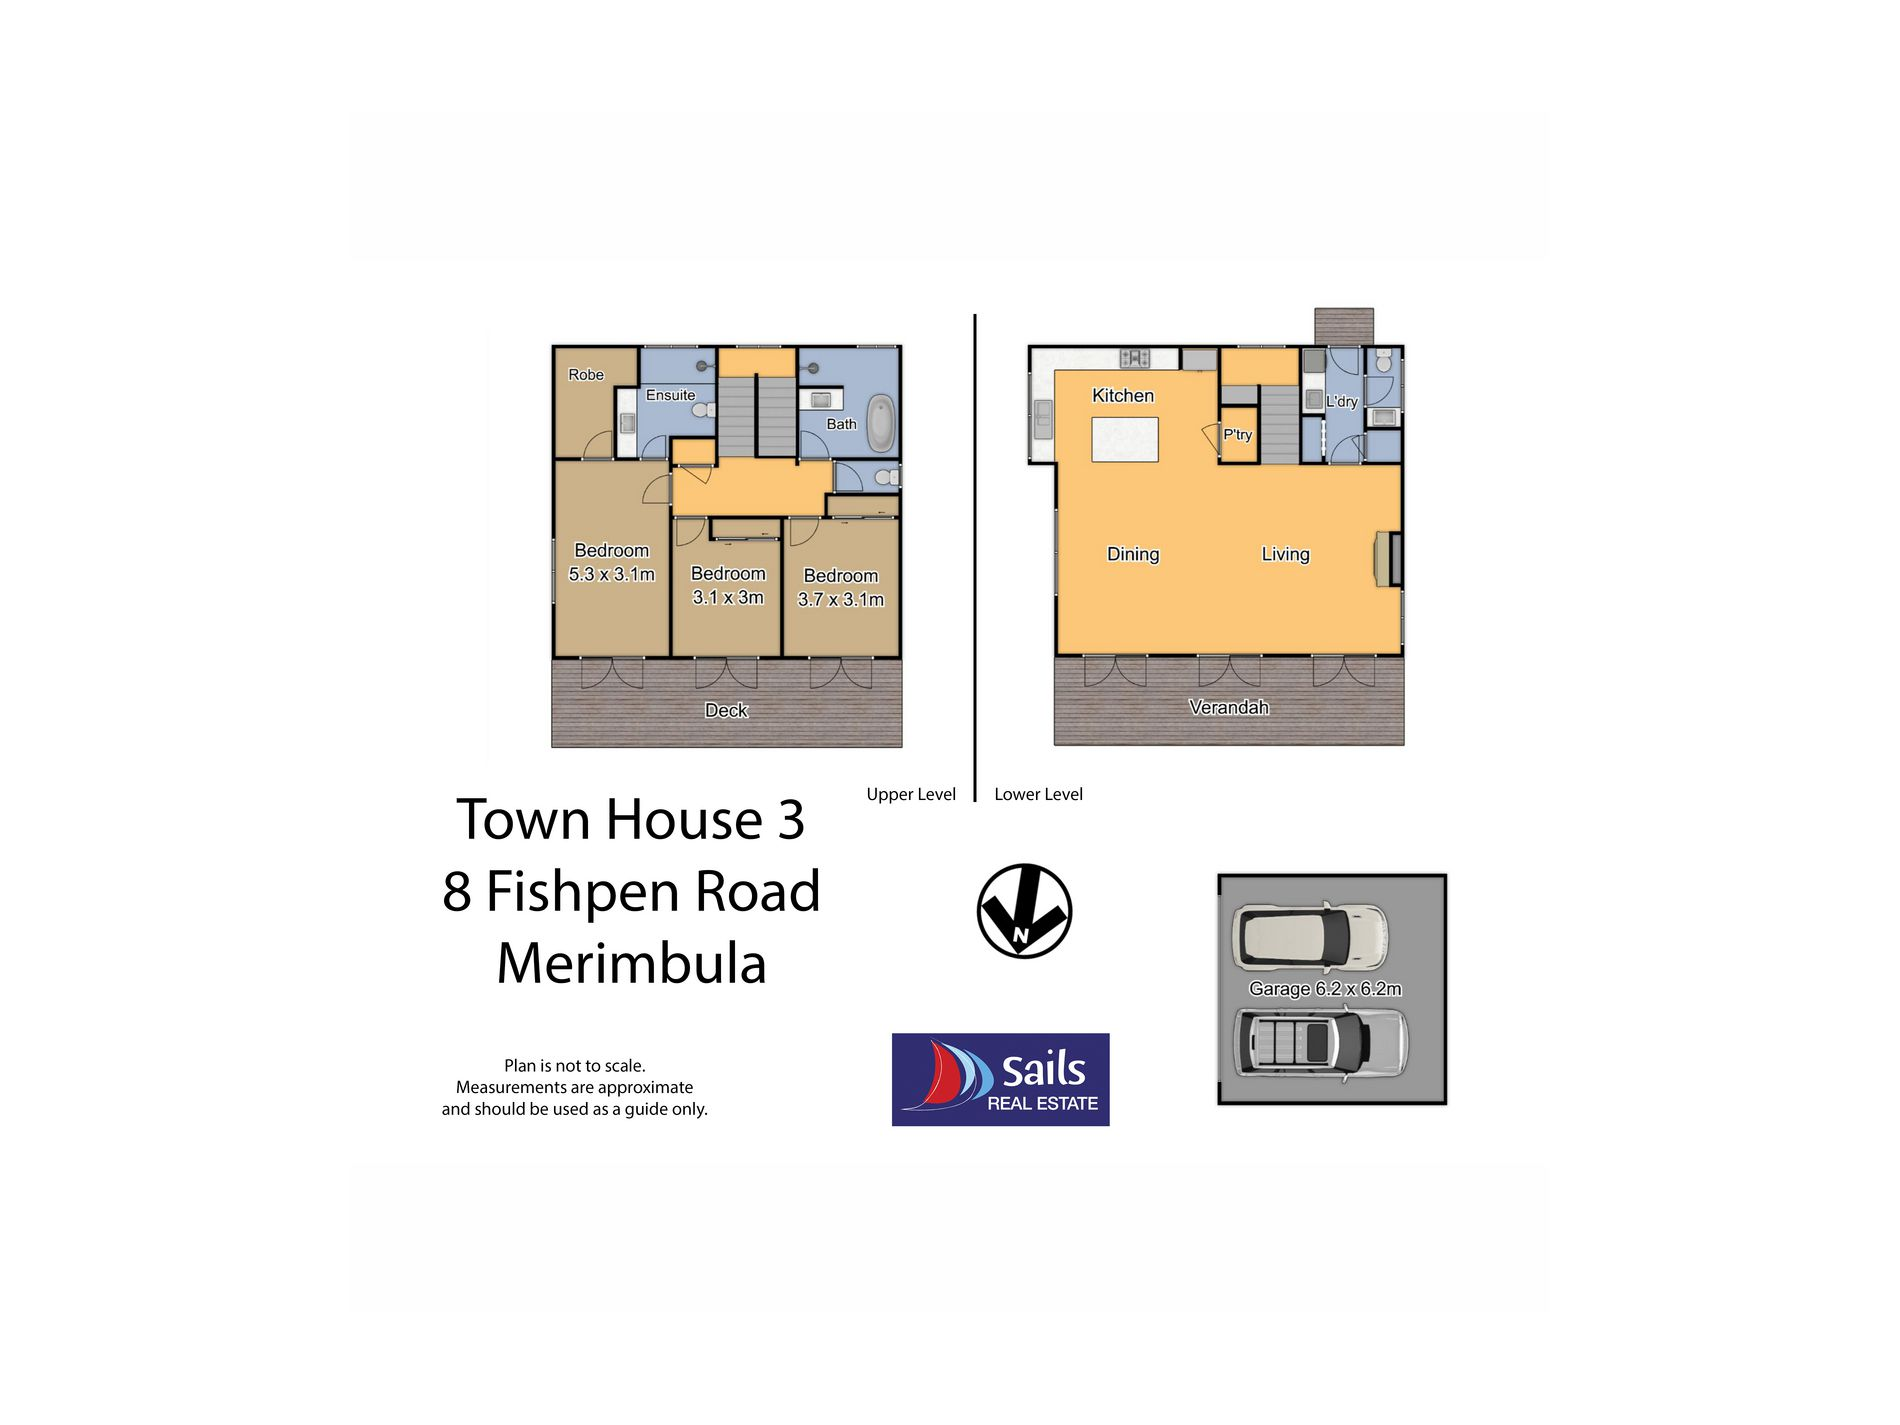 3 / 8 Fishpen Road, Merimbula